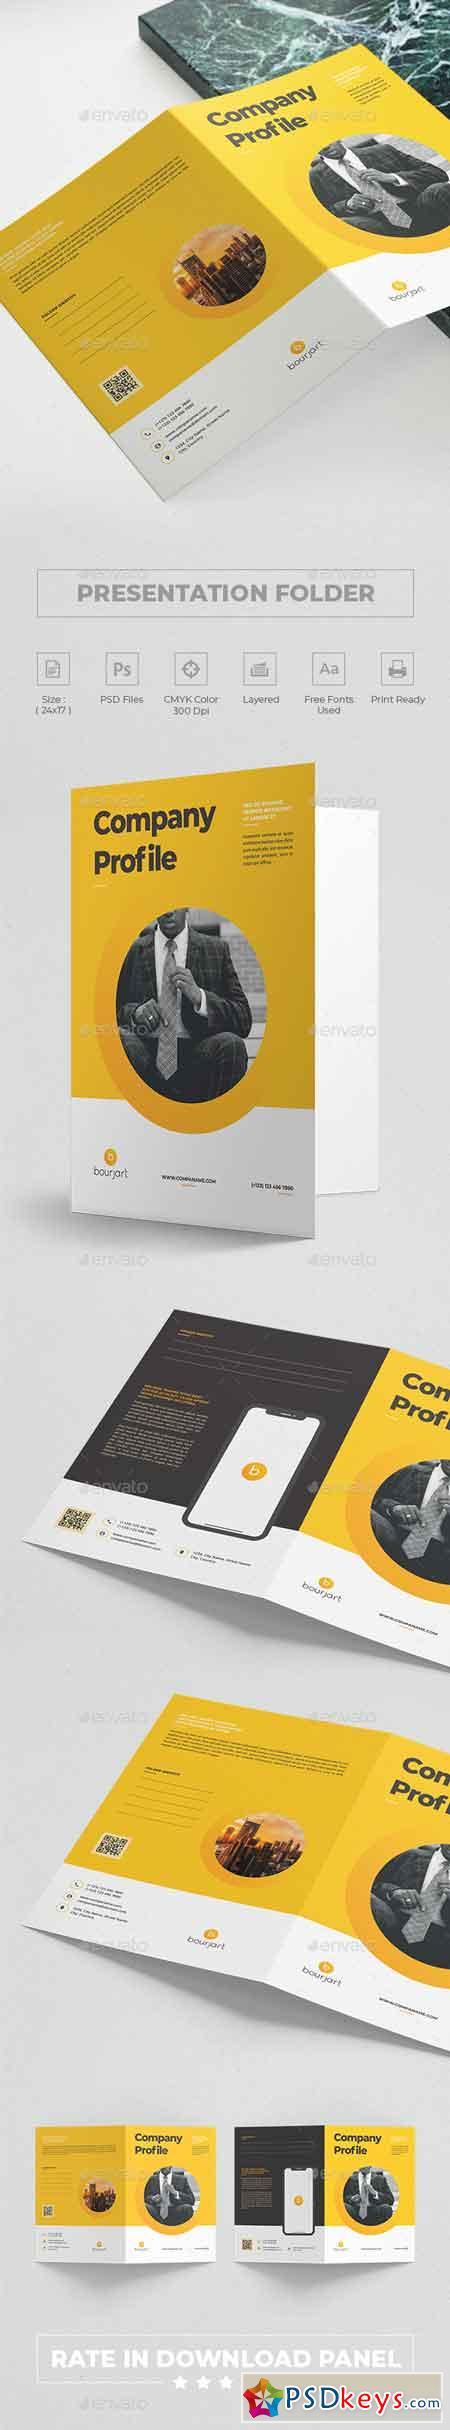 Presentation Folder 22873916